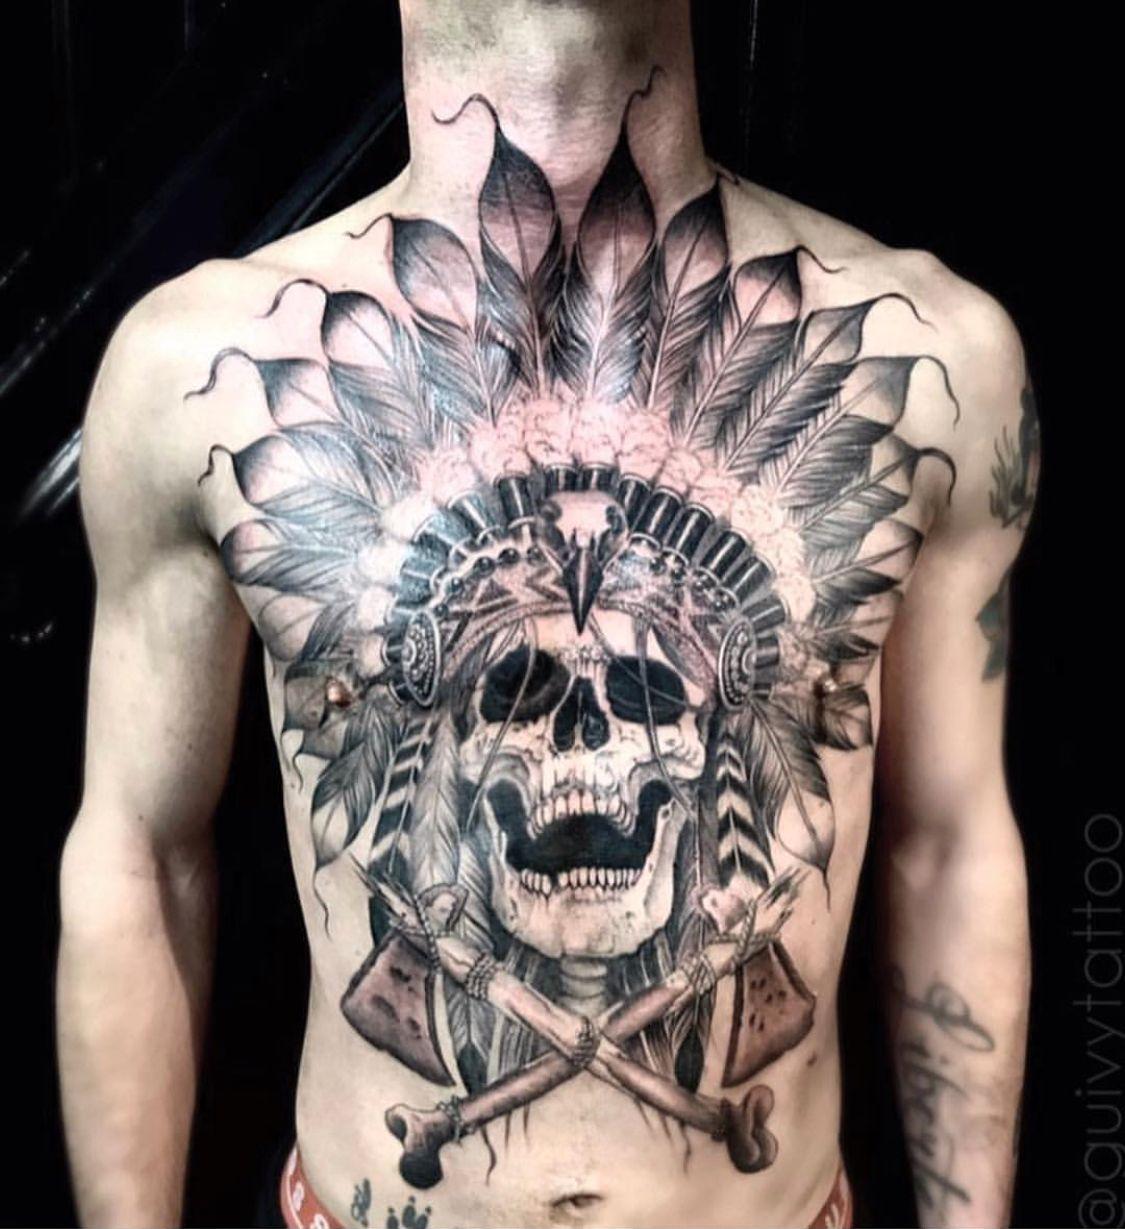 7d5cd63a831f7 Guivy Tattoo - Art For Sinners - GENEVA #native #american #tattoos #skull  #apache #Indian #indien #tatouage #geneve #salon #studio #cheyenne #homme # tatoo # ...